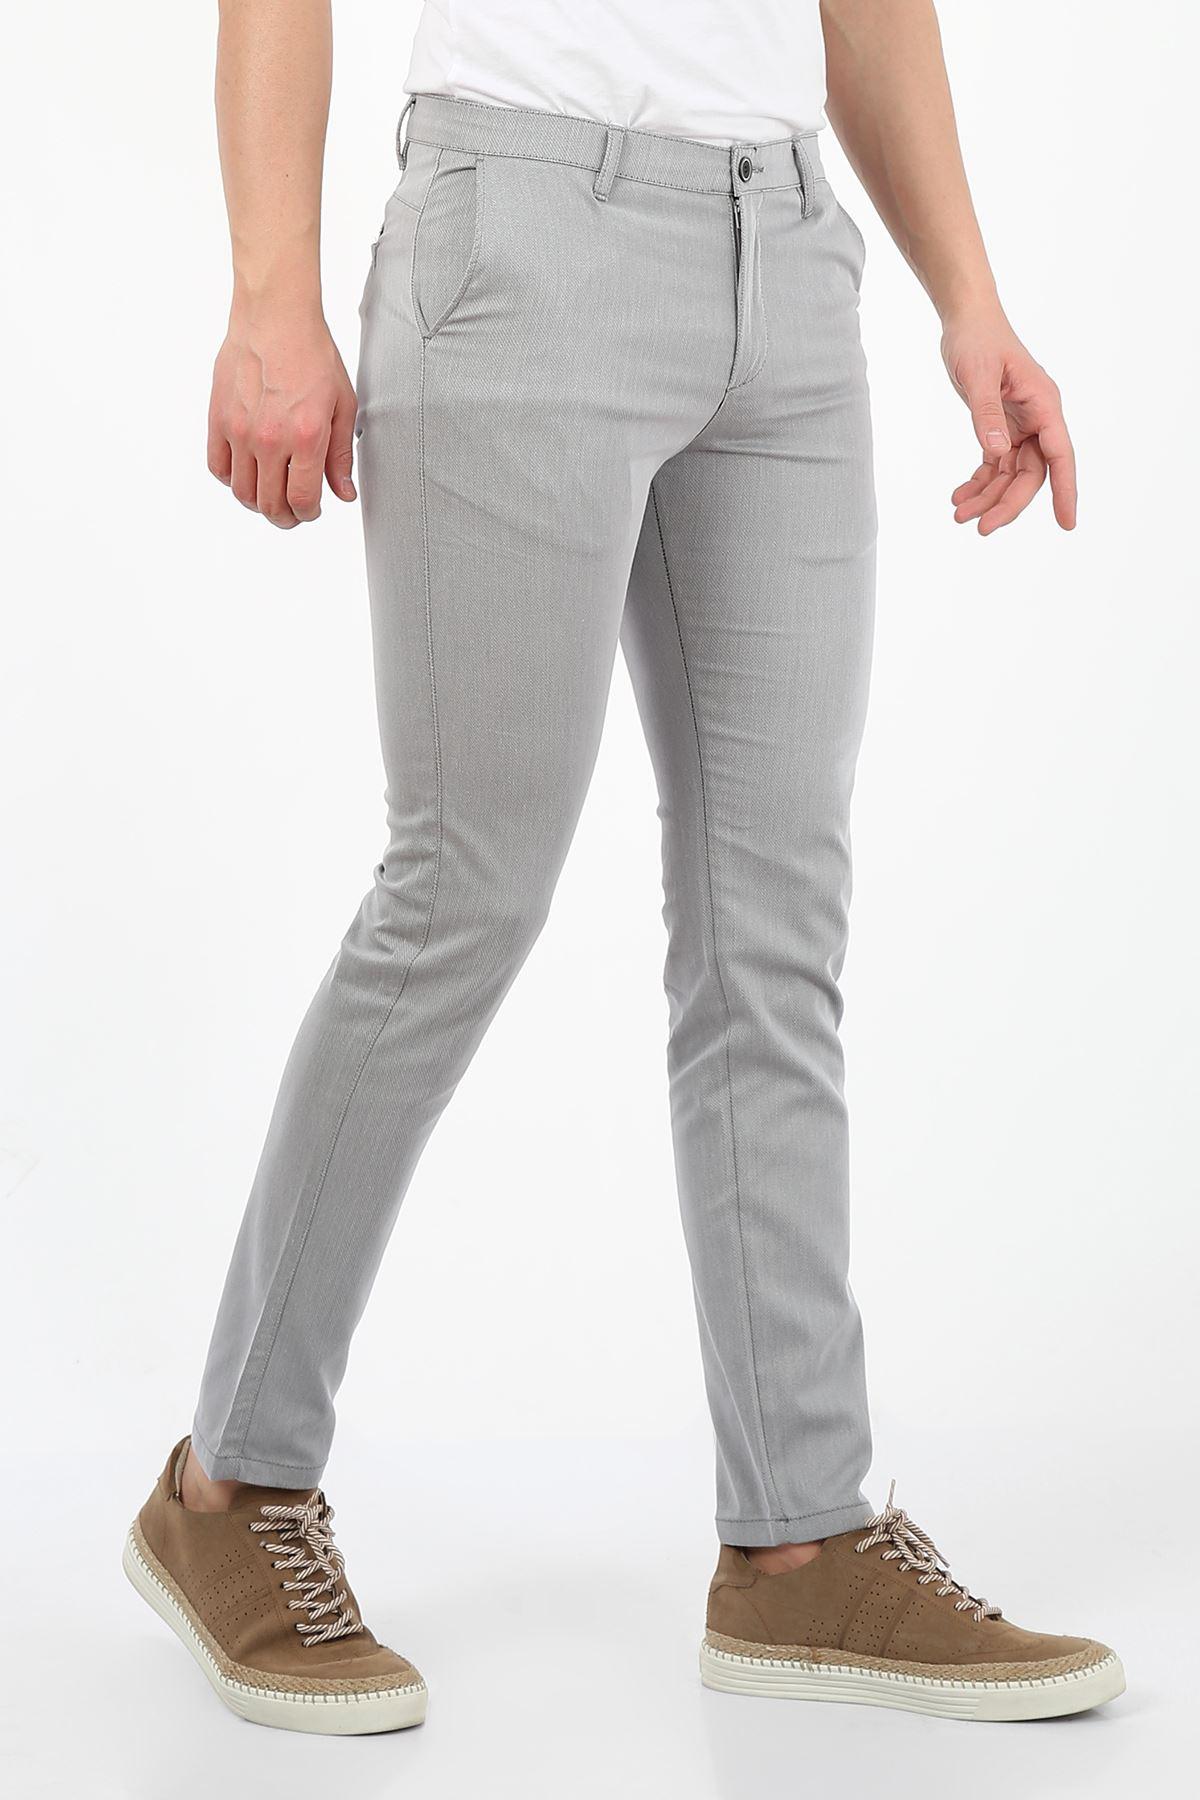 Gri Slim Fit Erkek Chino Pantolon -OLİVER